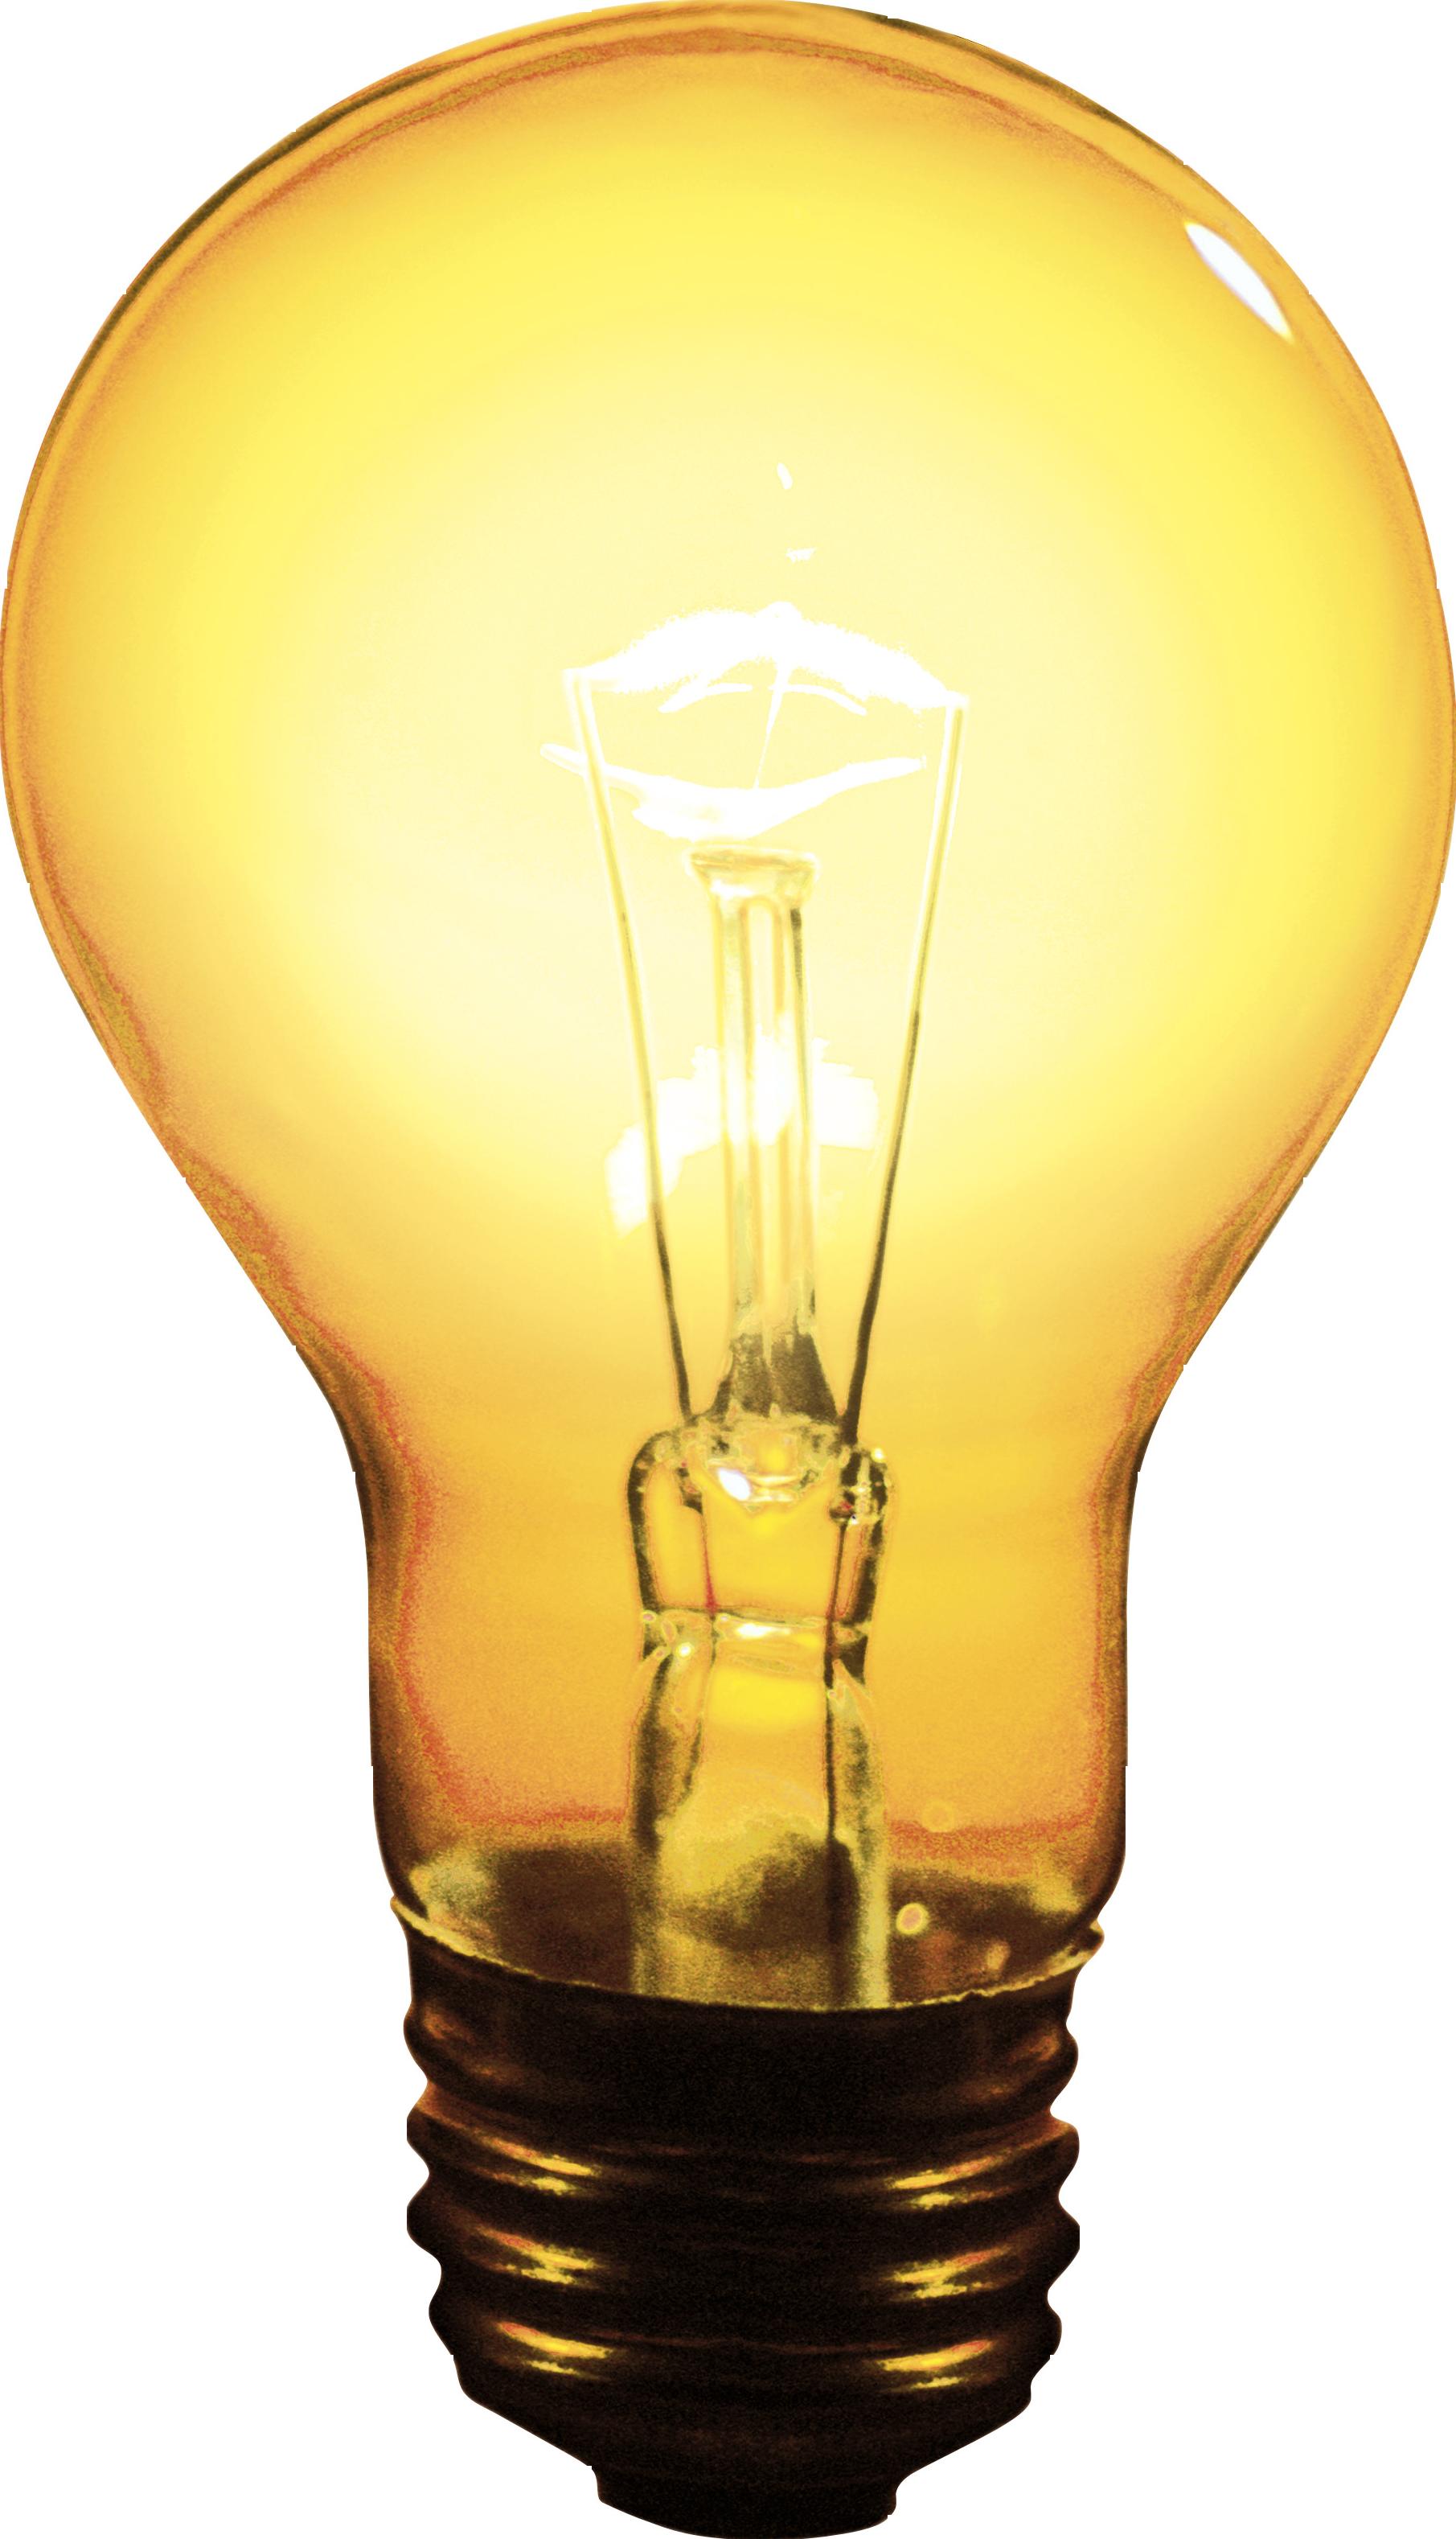 Lamp PNG Image - PurePNG | Free transparent CC0 PNG Image ...